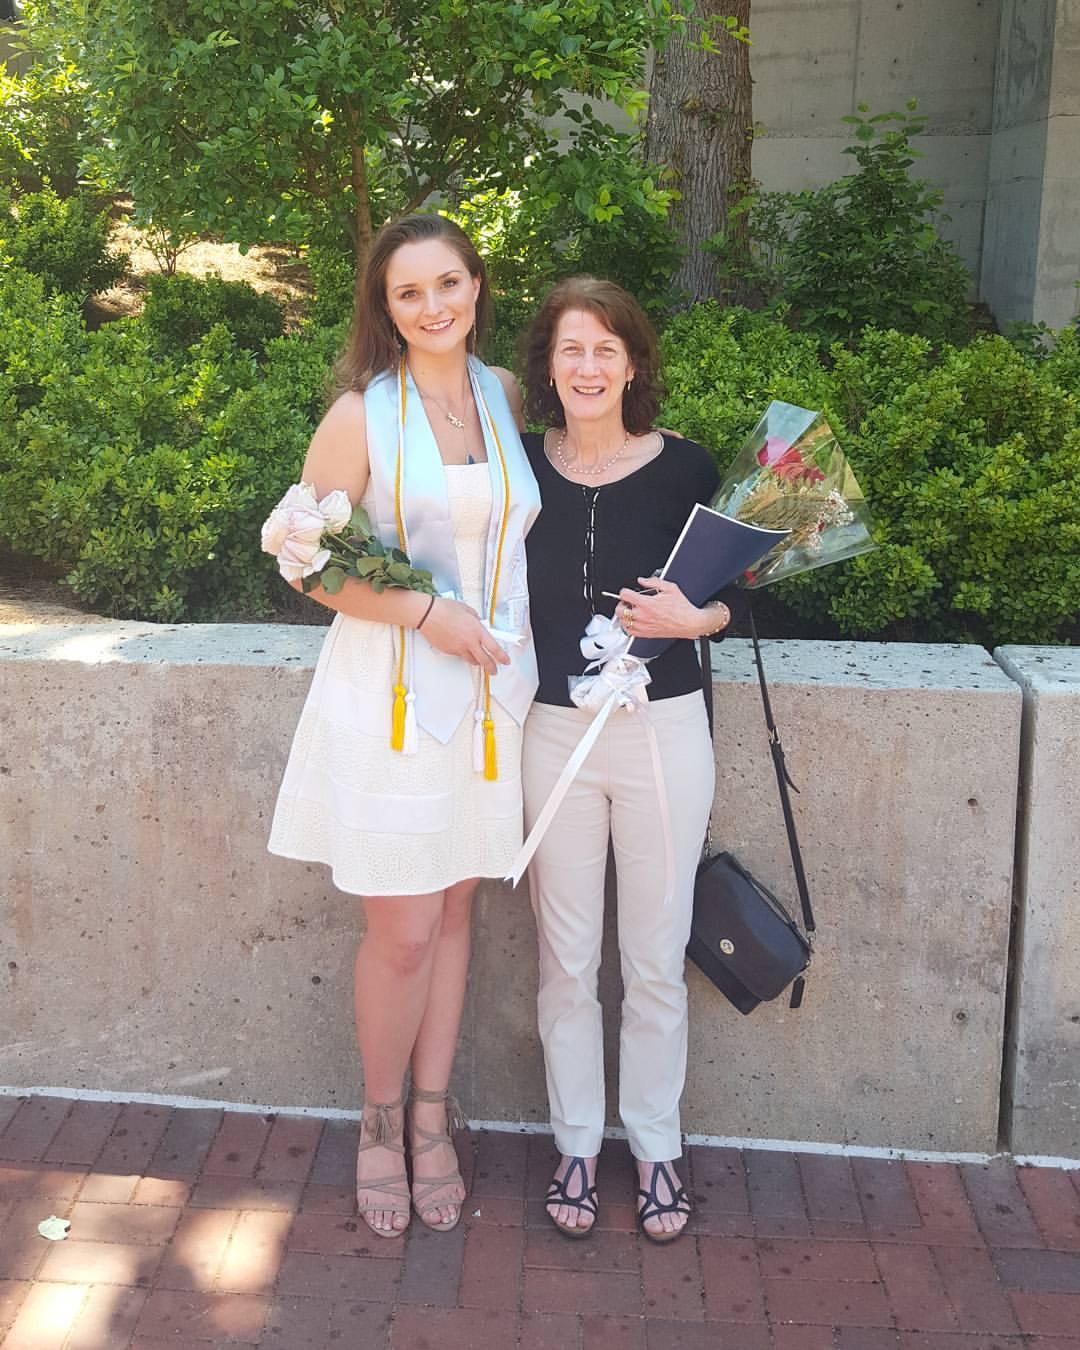 Dr. Cynthia Blakeley - Teacher. Editor. Mentor. Friend.